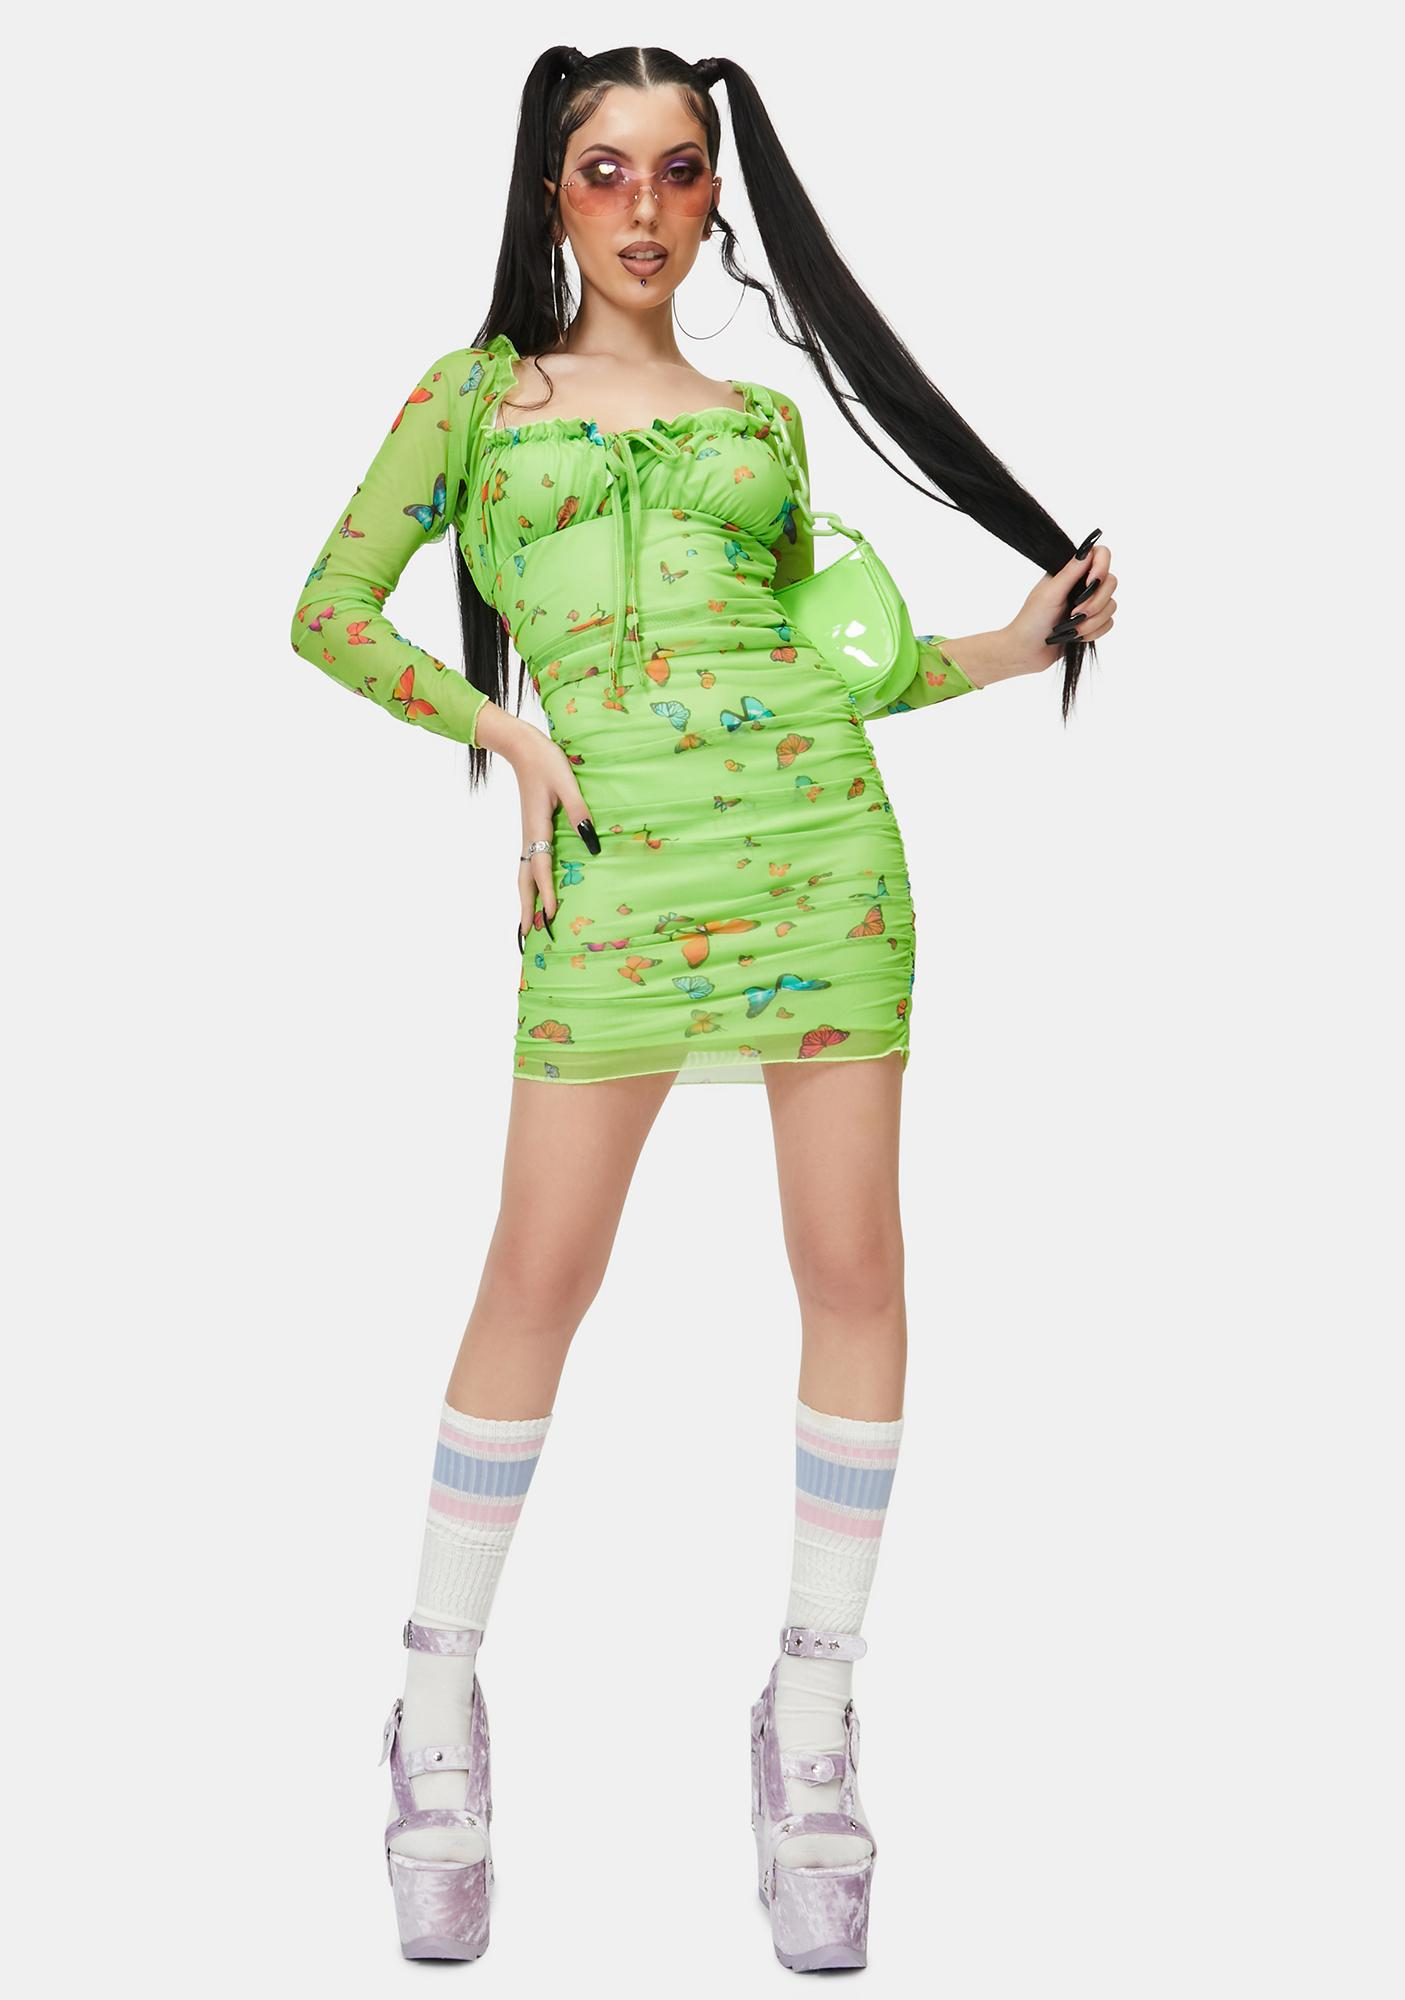 NEW GIRL ORDER Butterfly Dress